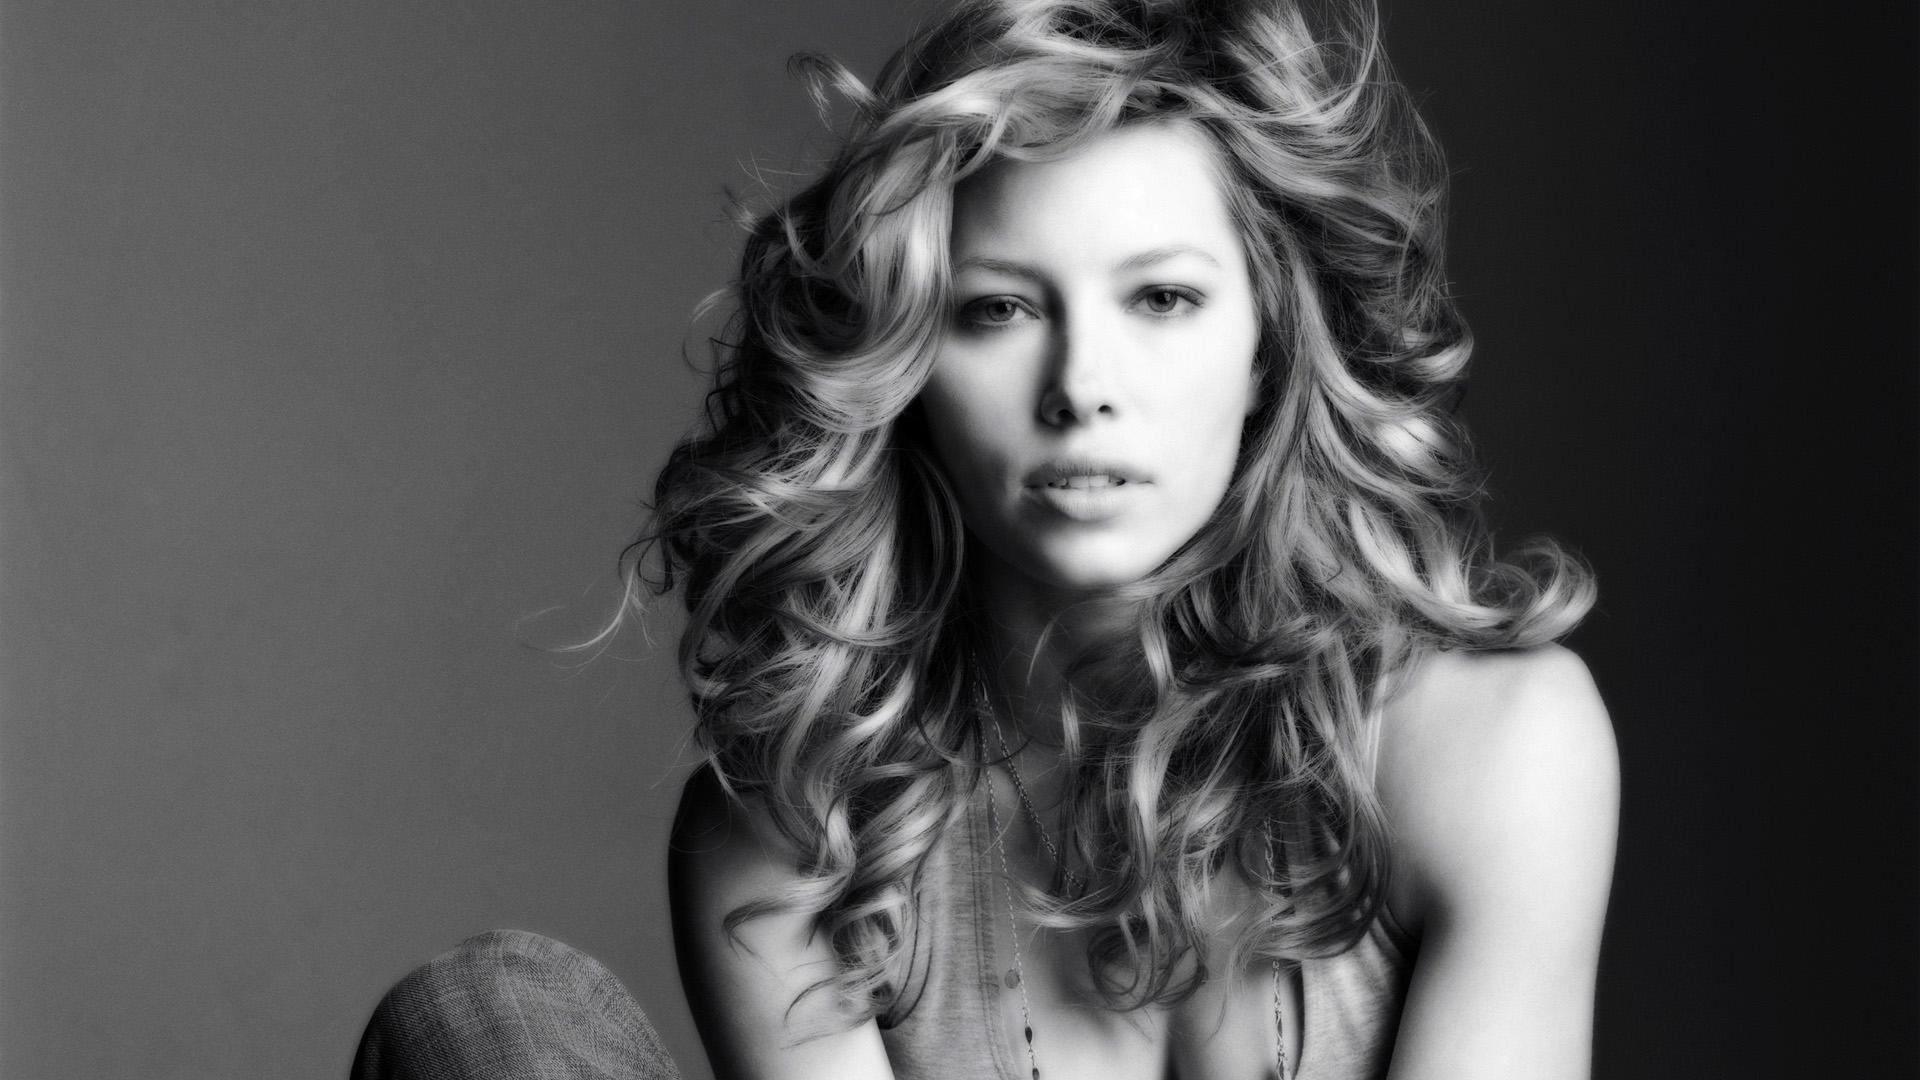 jessica biel hd wallpaper celebrity - photo #36